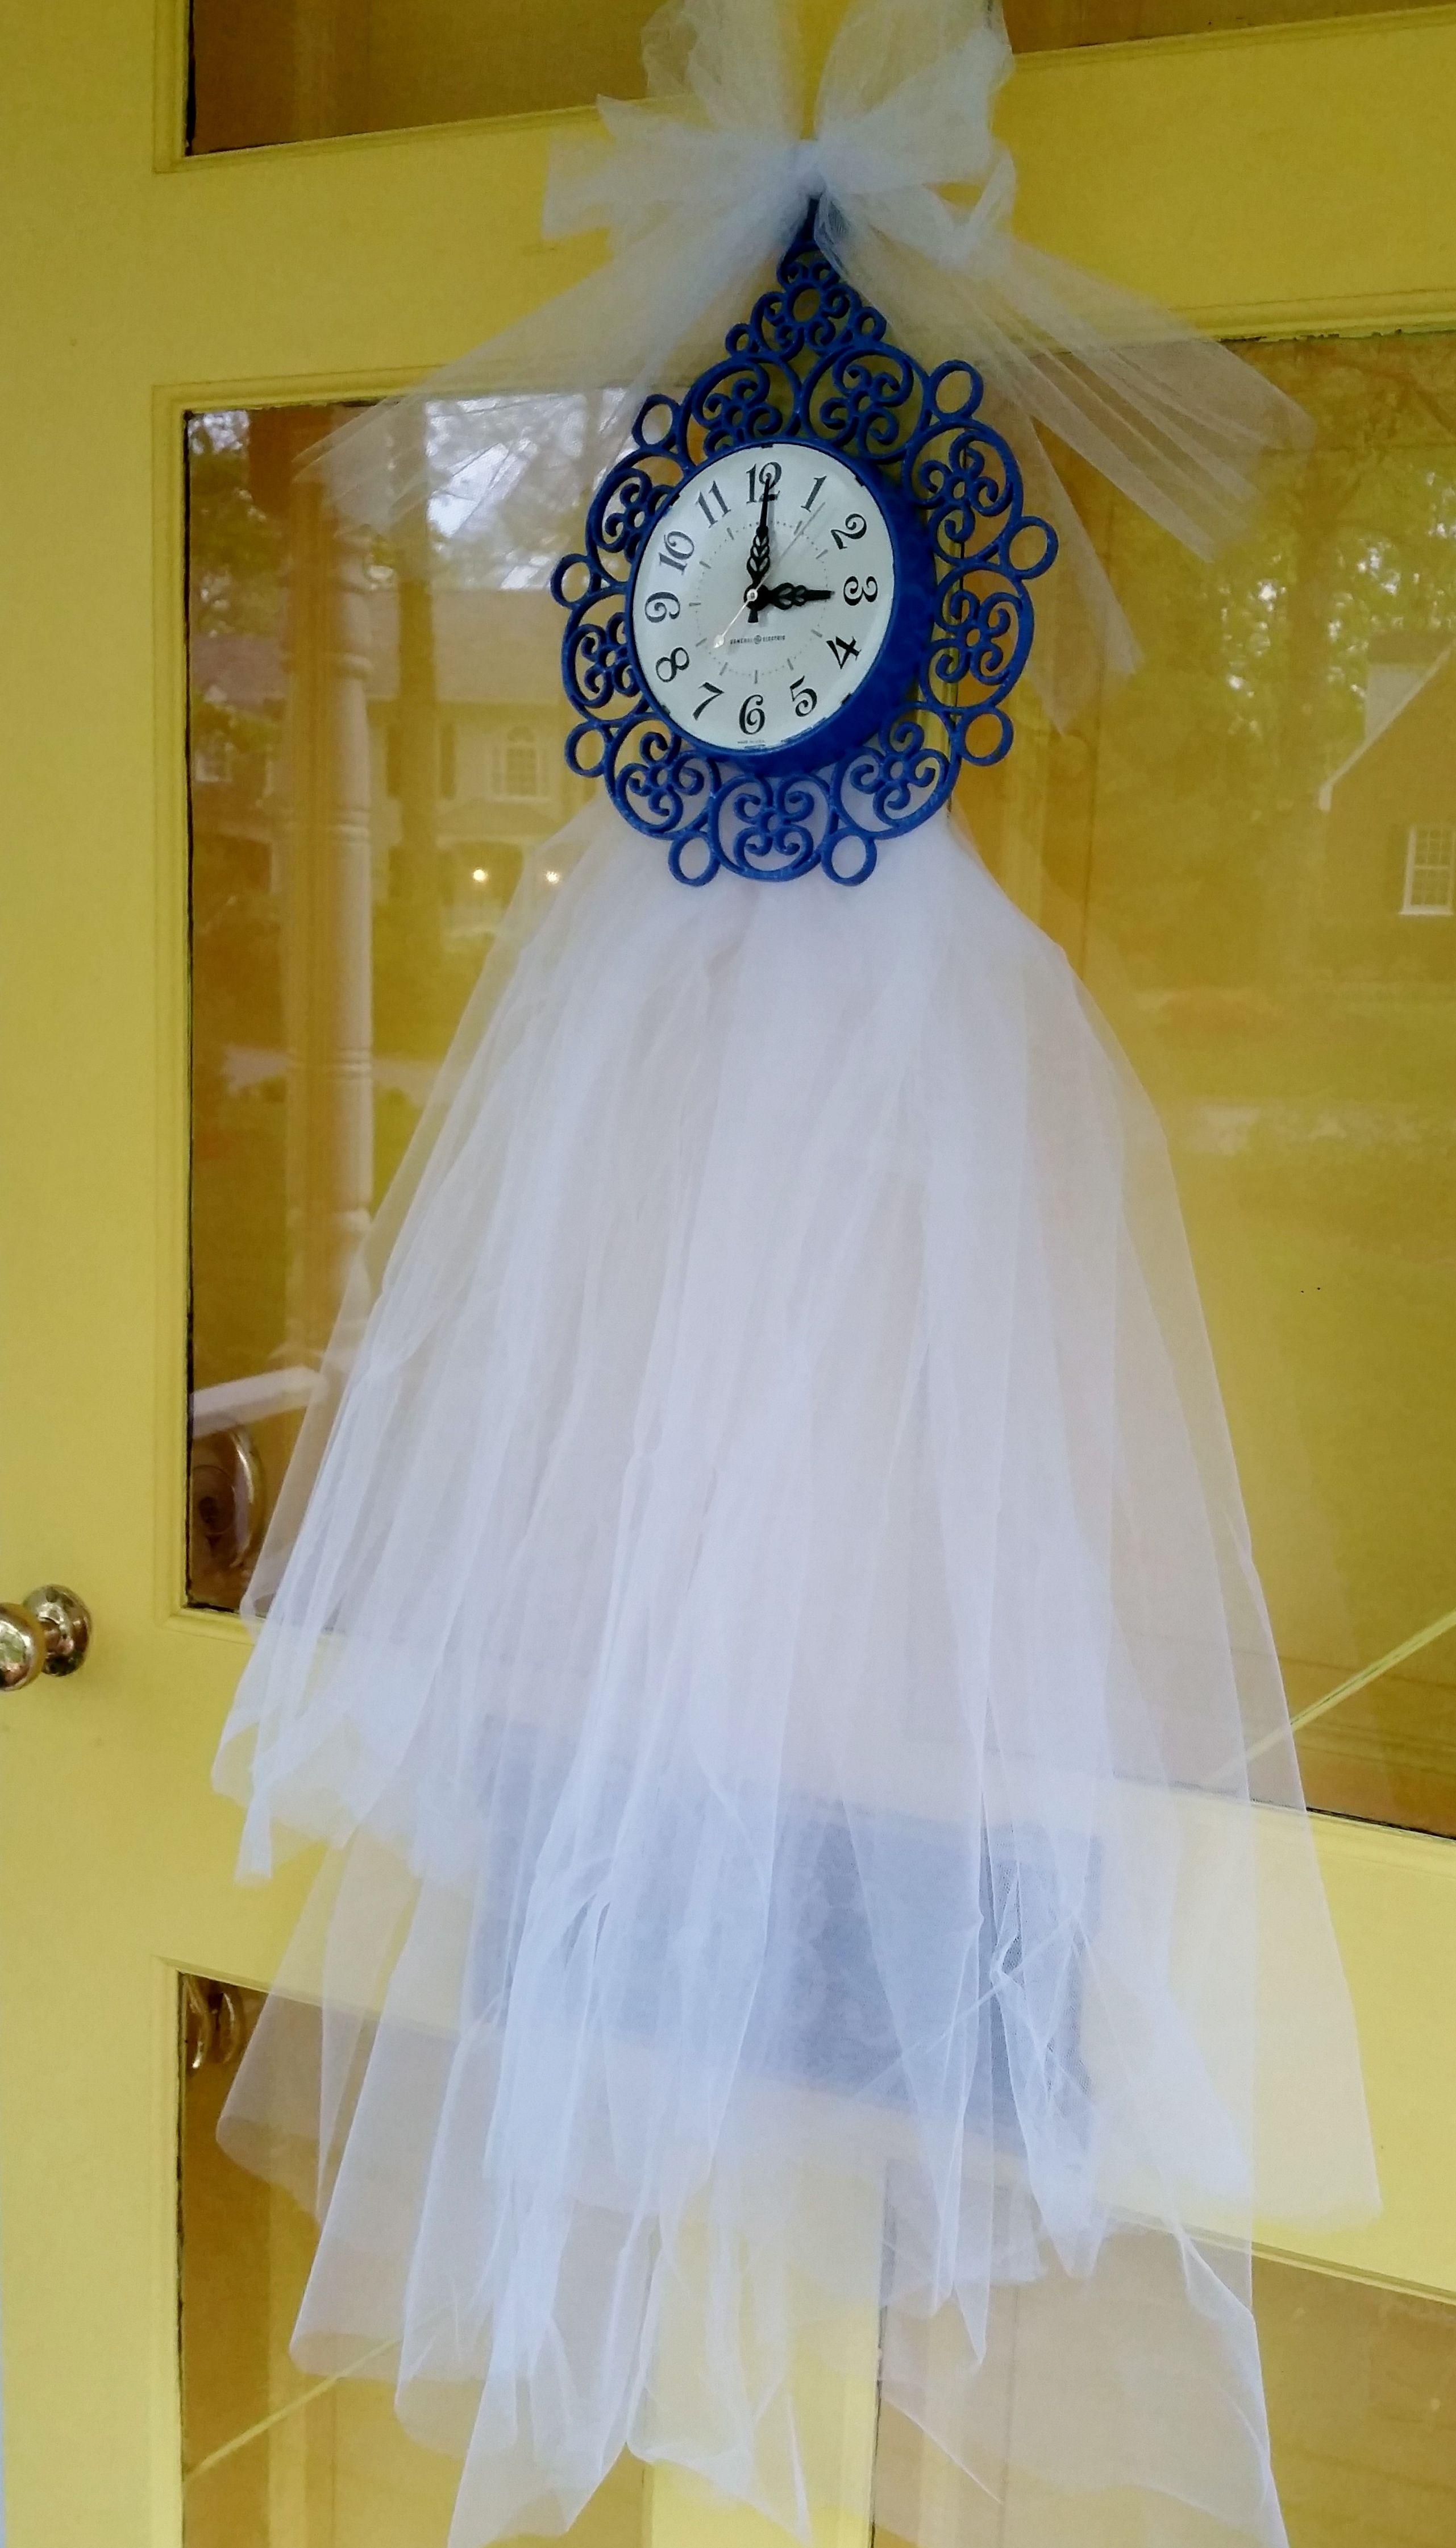 Around the clock bridal shower, bridal shower door decor. Purchased ...